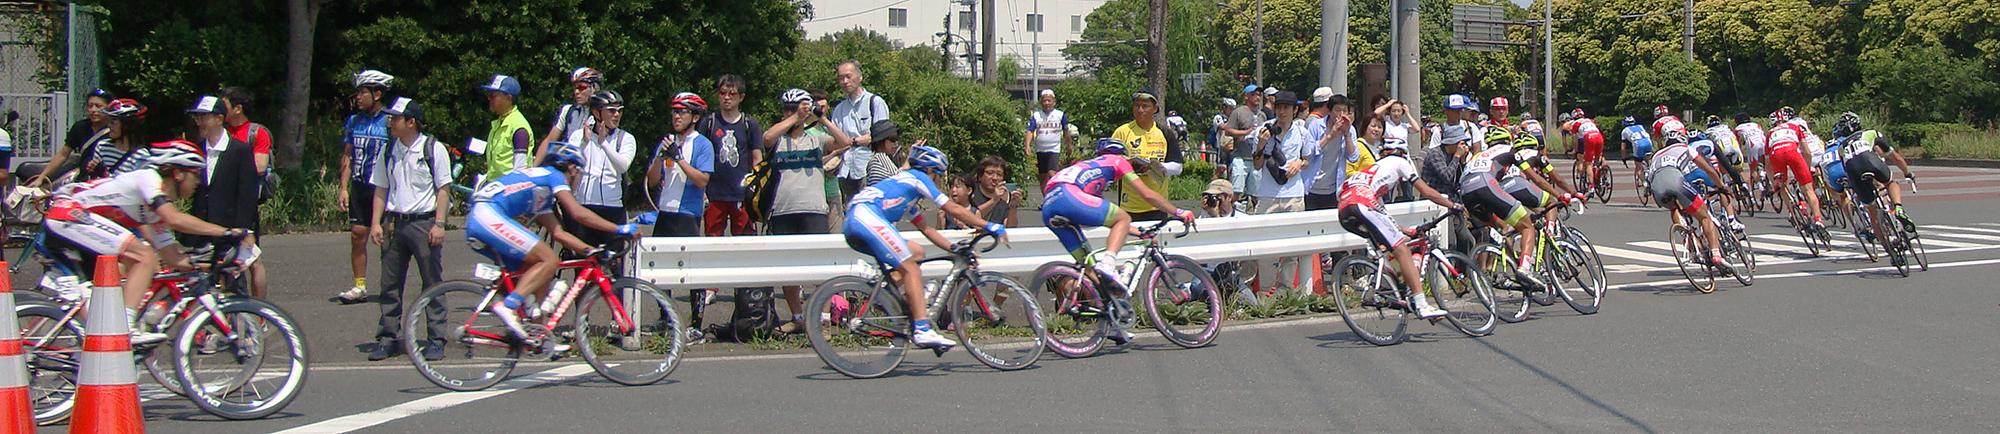 http://moritetsu.info/bicycle/img/DSC06604ss.jpg